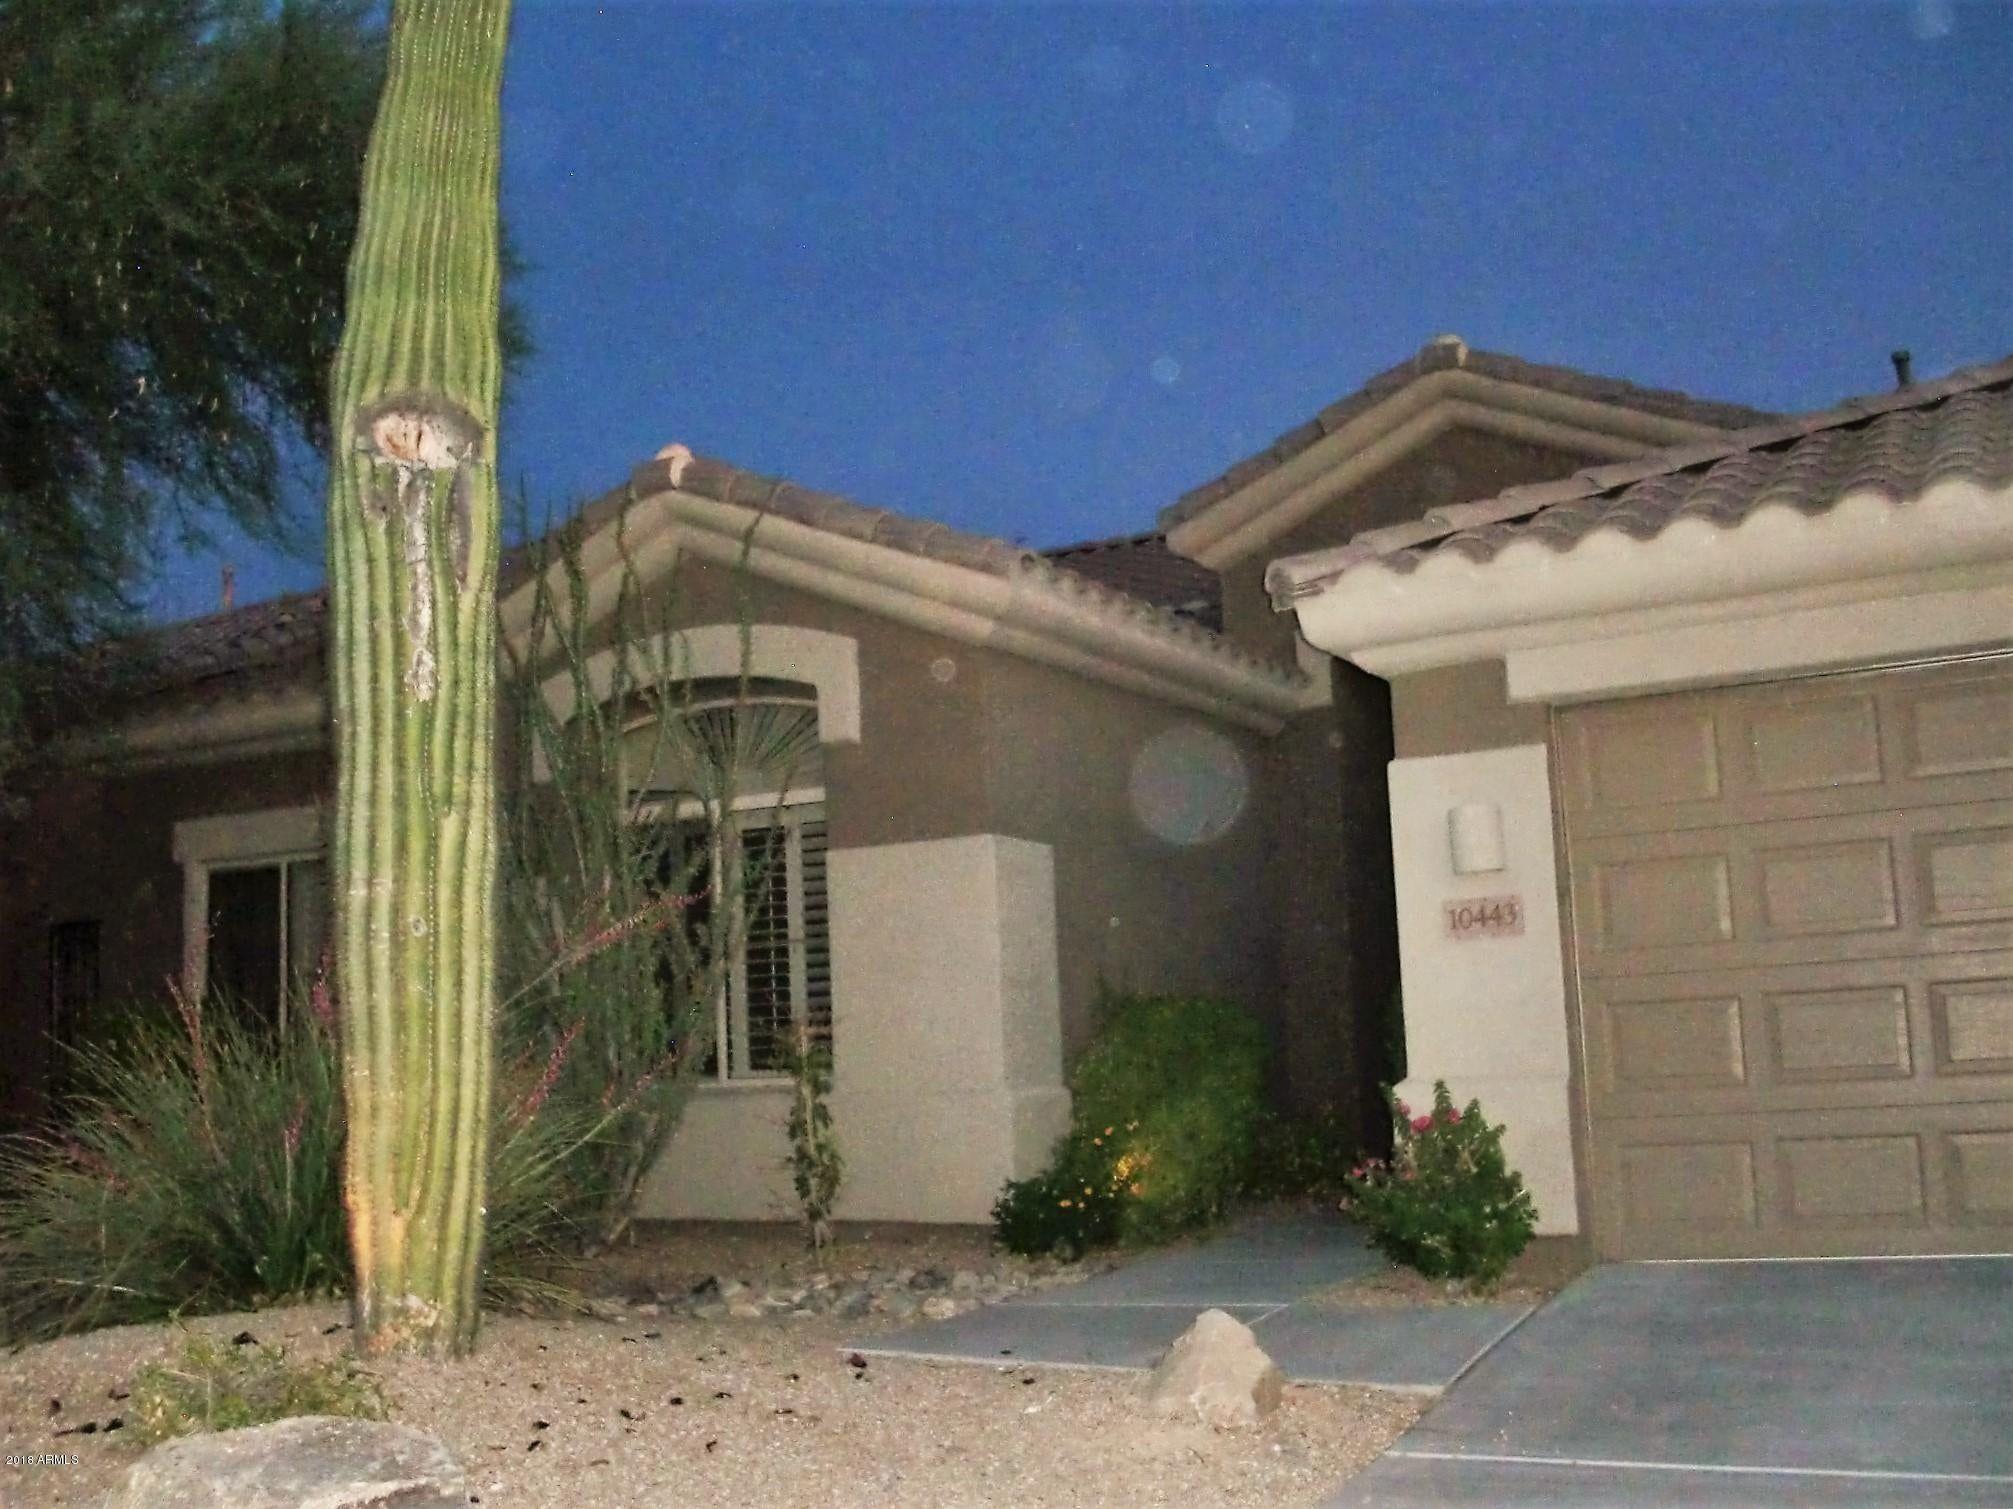 10443  E SHEENA   Drive Scottsdale AZ 85255